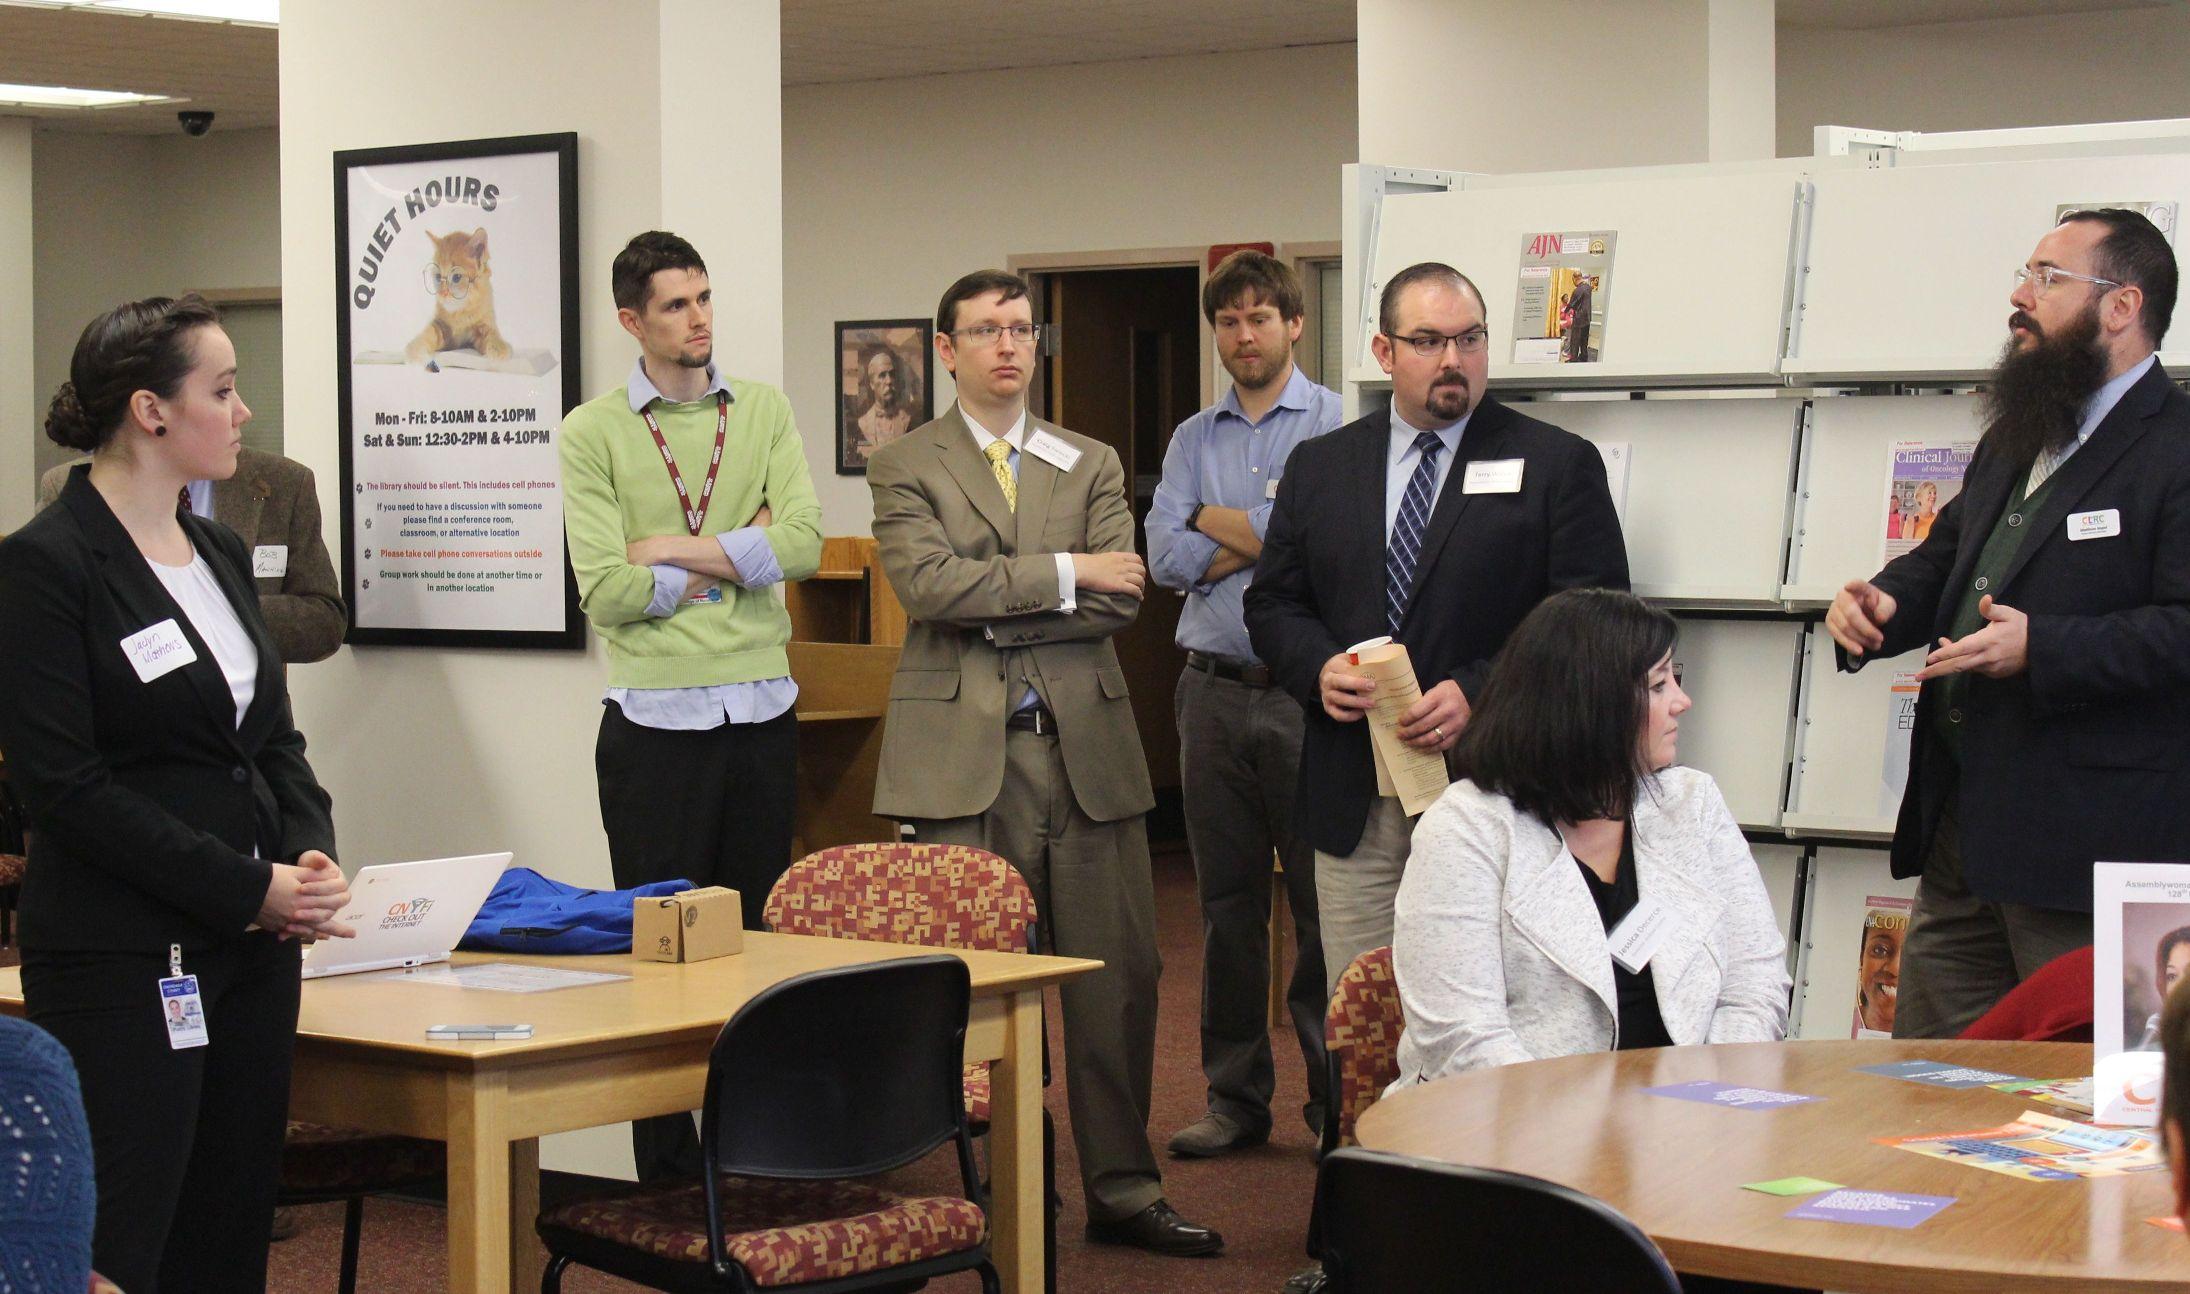 Syracuse Legislative Breakfast Was a Great (Speed) Date | CLRC